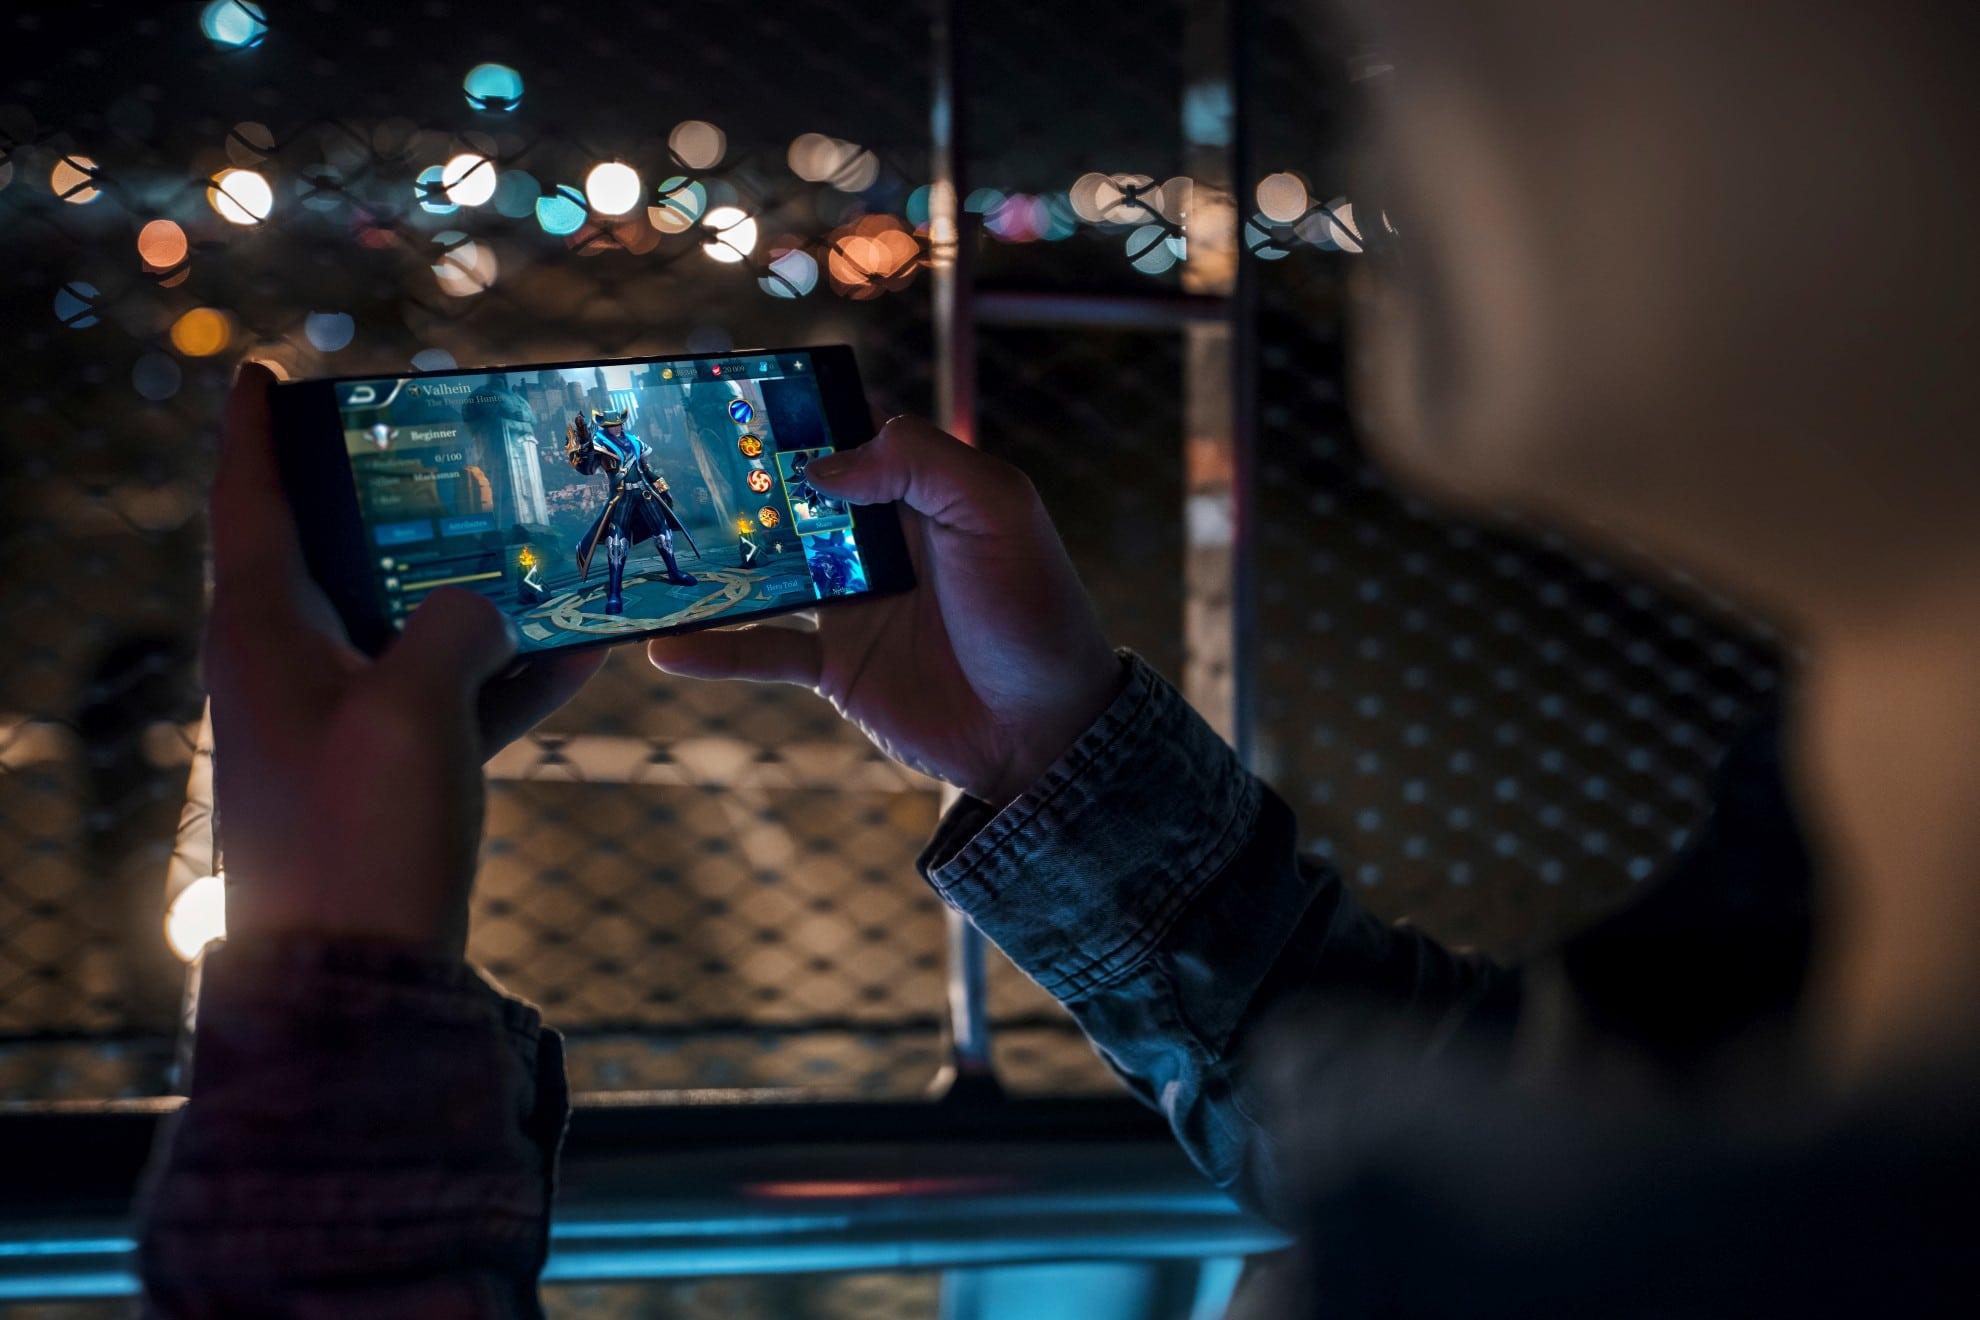 Klobiges Gaming-Smartphone. (Foto: Razer)